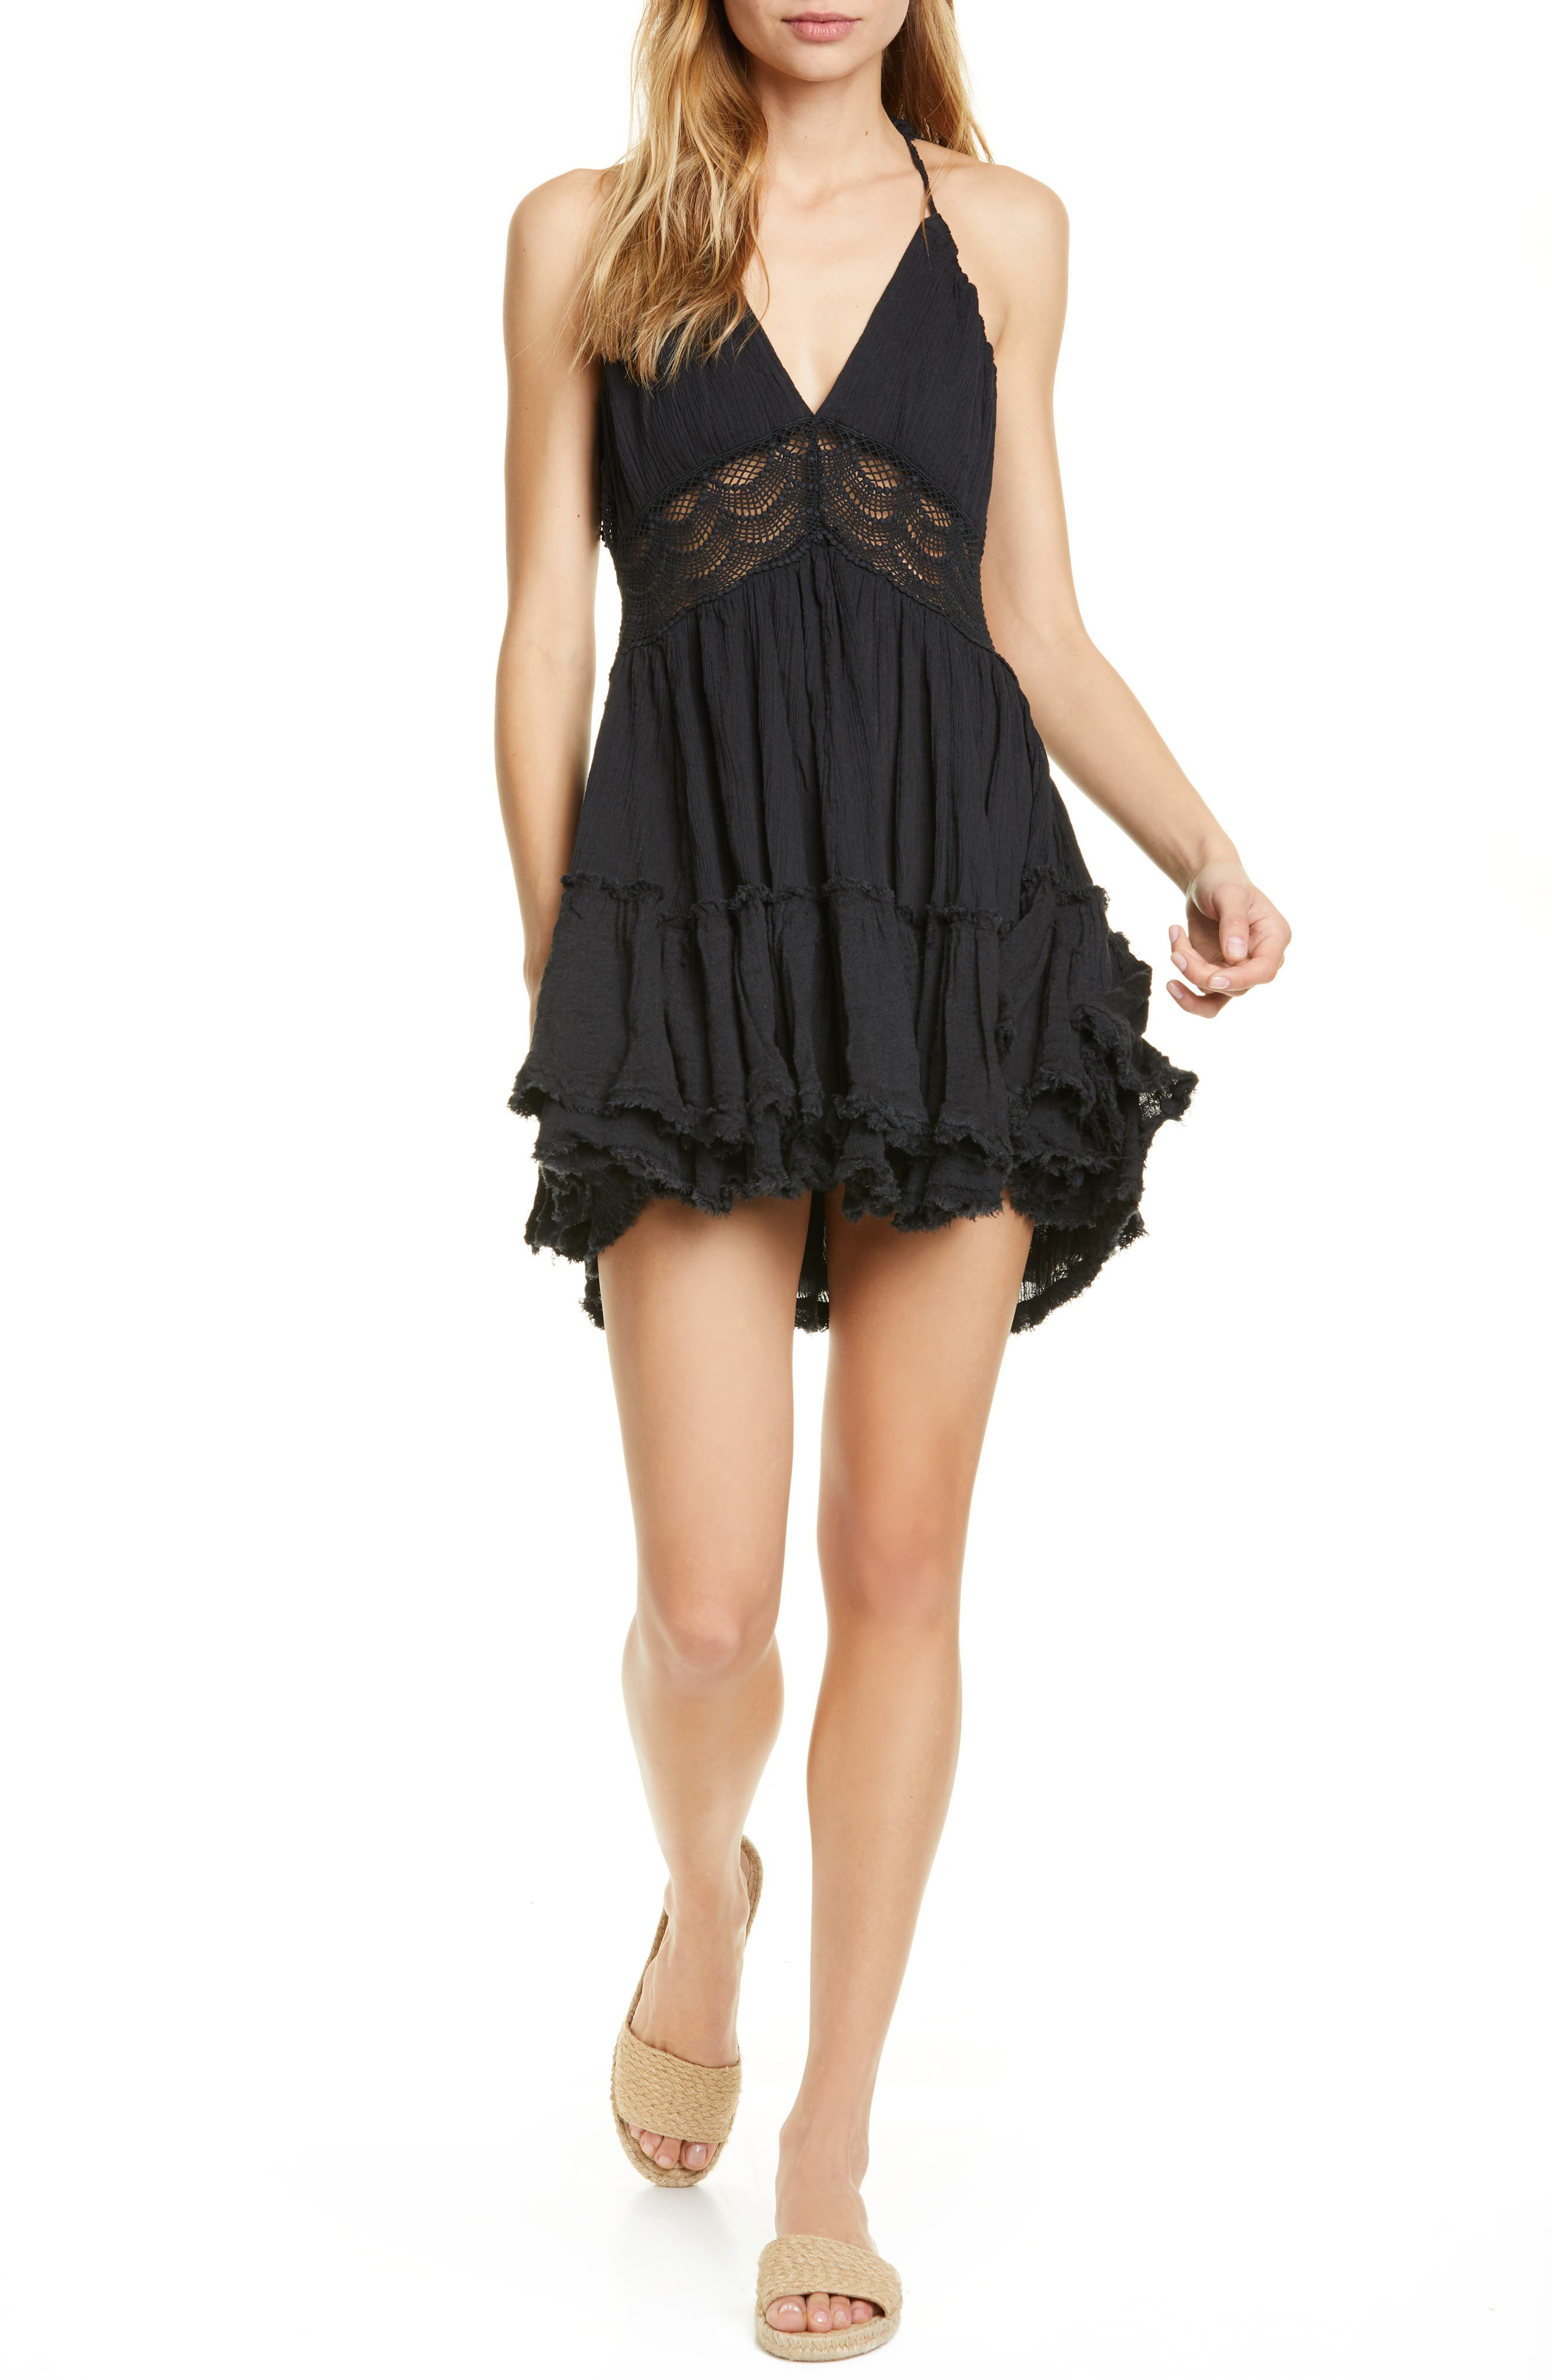 Endless Summer By Free People 200 Degree Minidress, Black